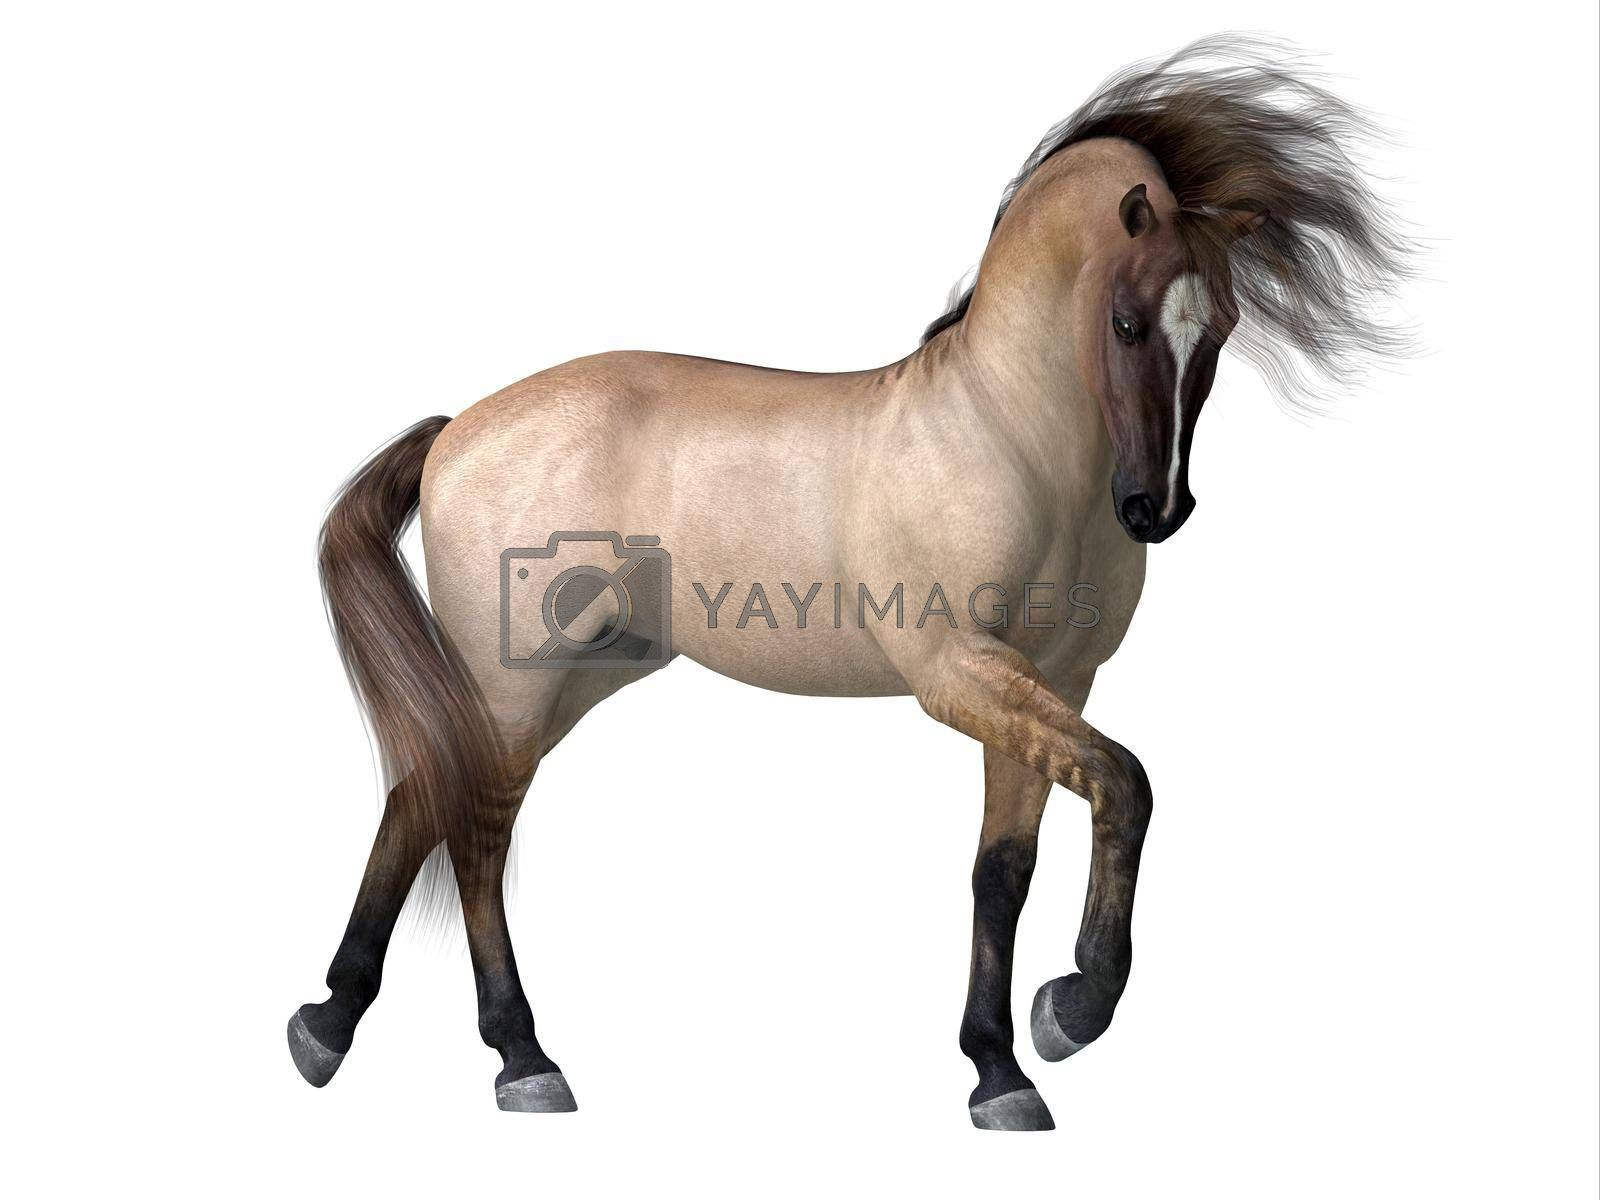 Royalty free image of Grulla Dun Horse by Catmando